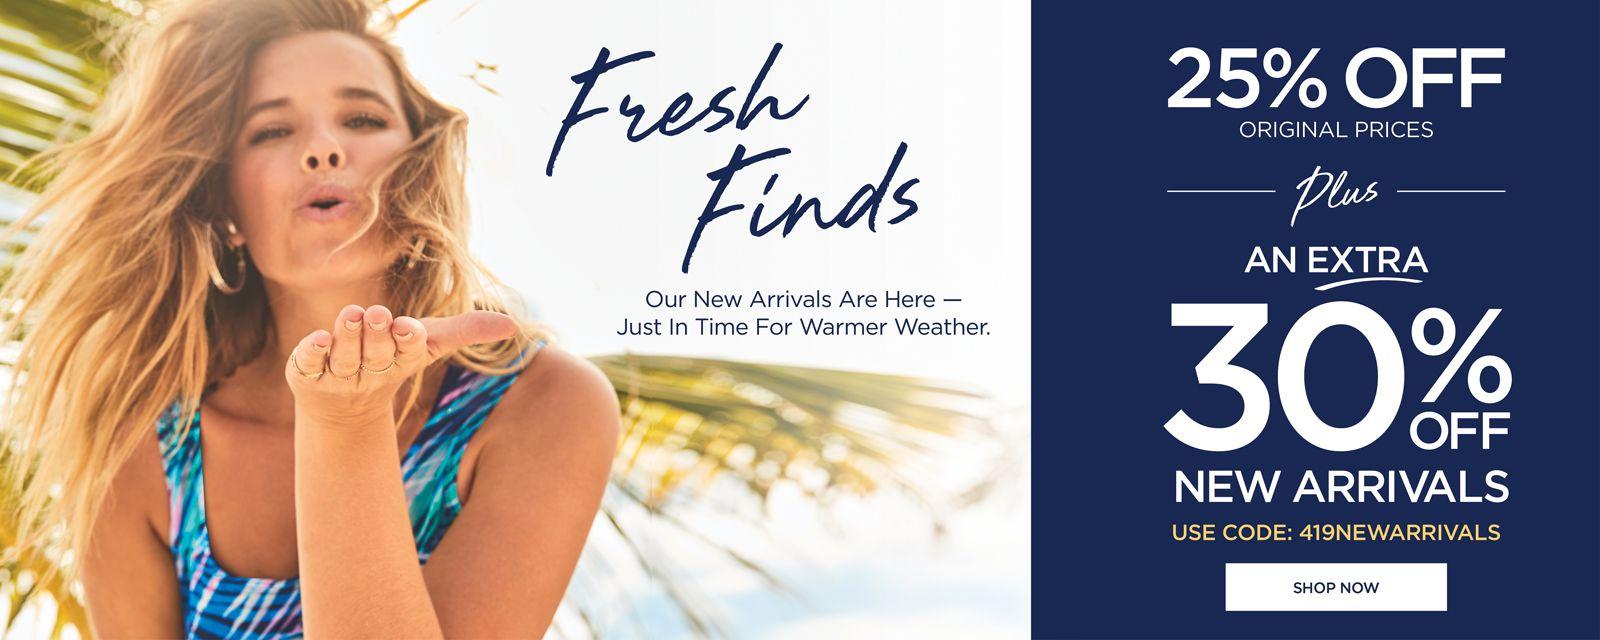 0c223c4d3d3 Get 50% Off Sitewide + Free Shipping on Swimwear, Swim Dresses, Bikinis,